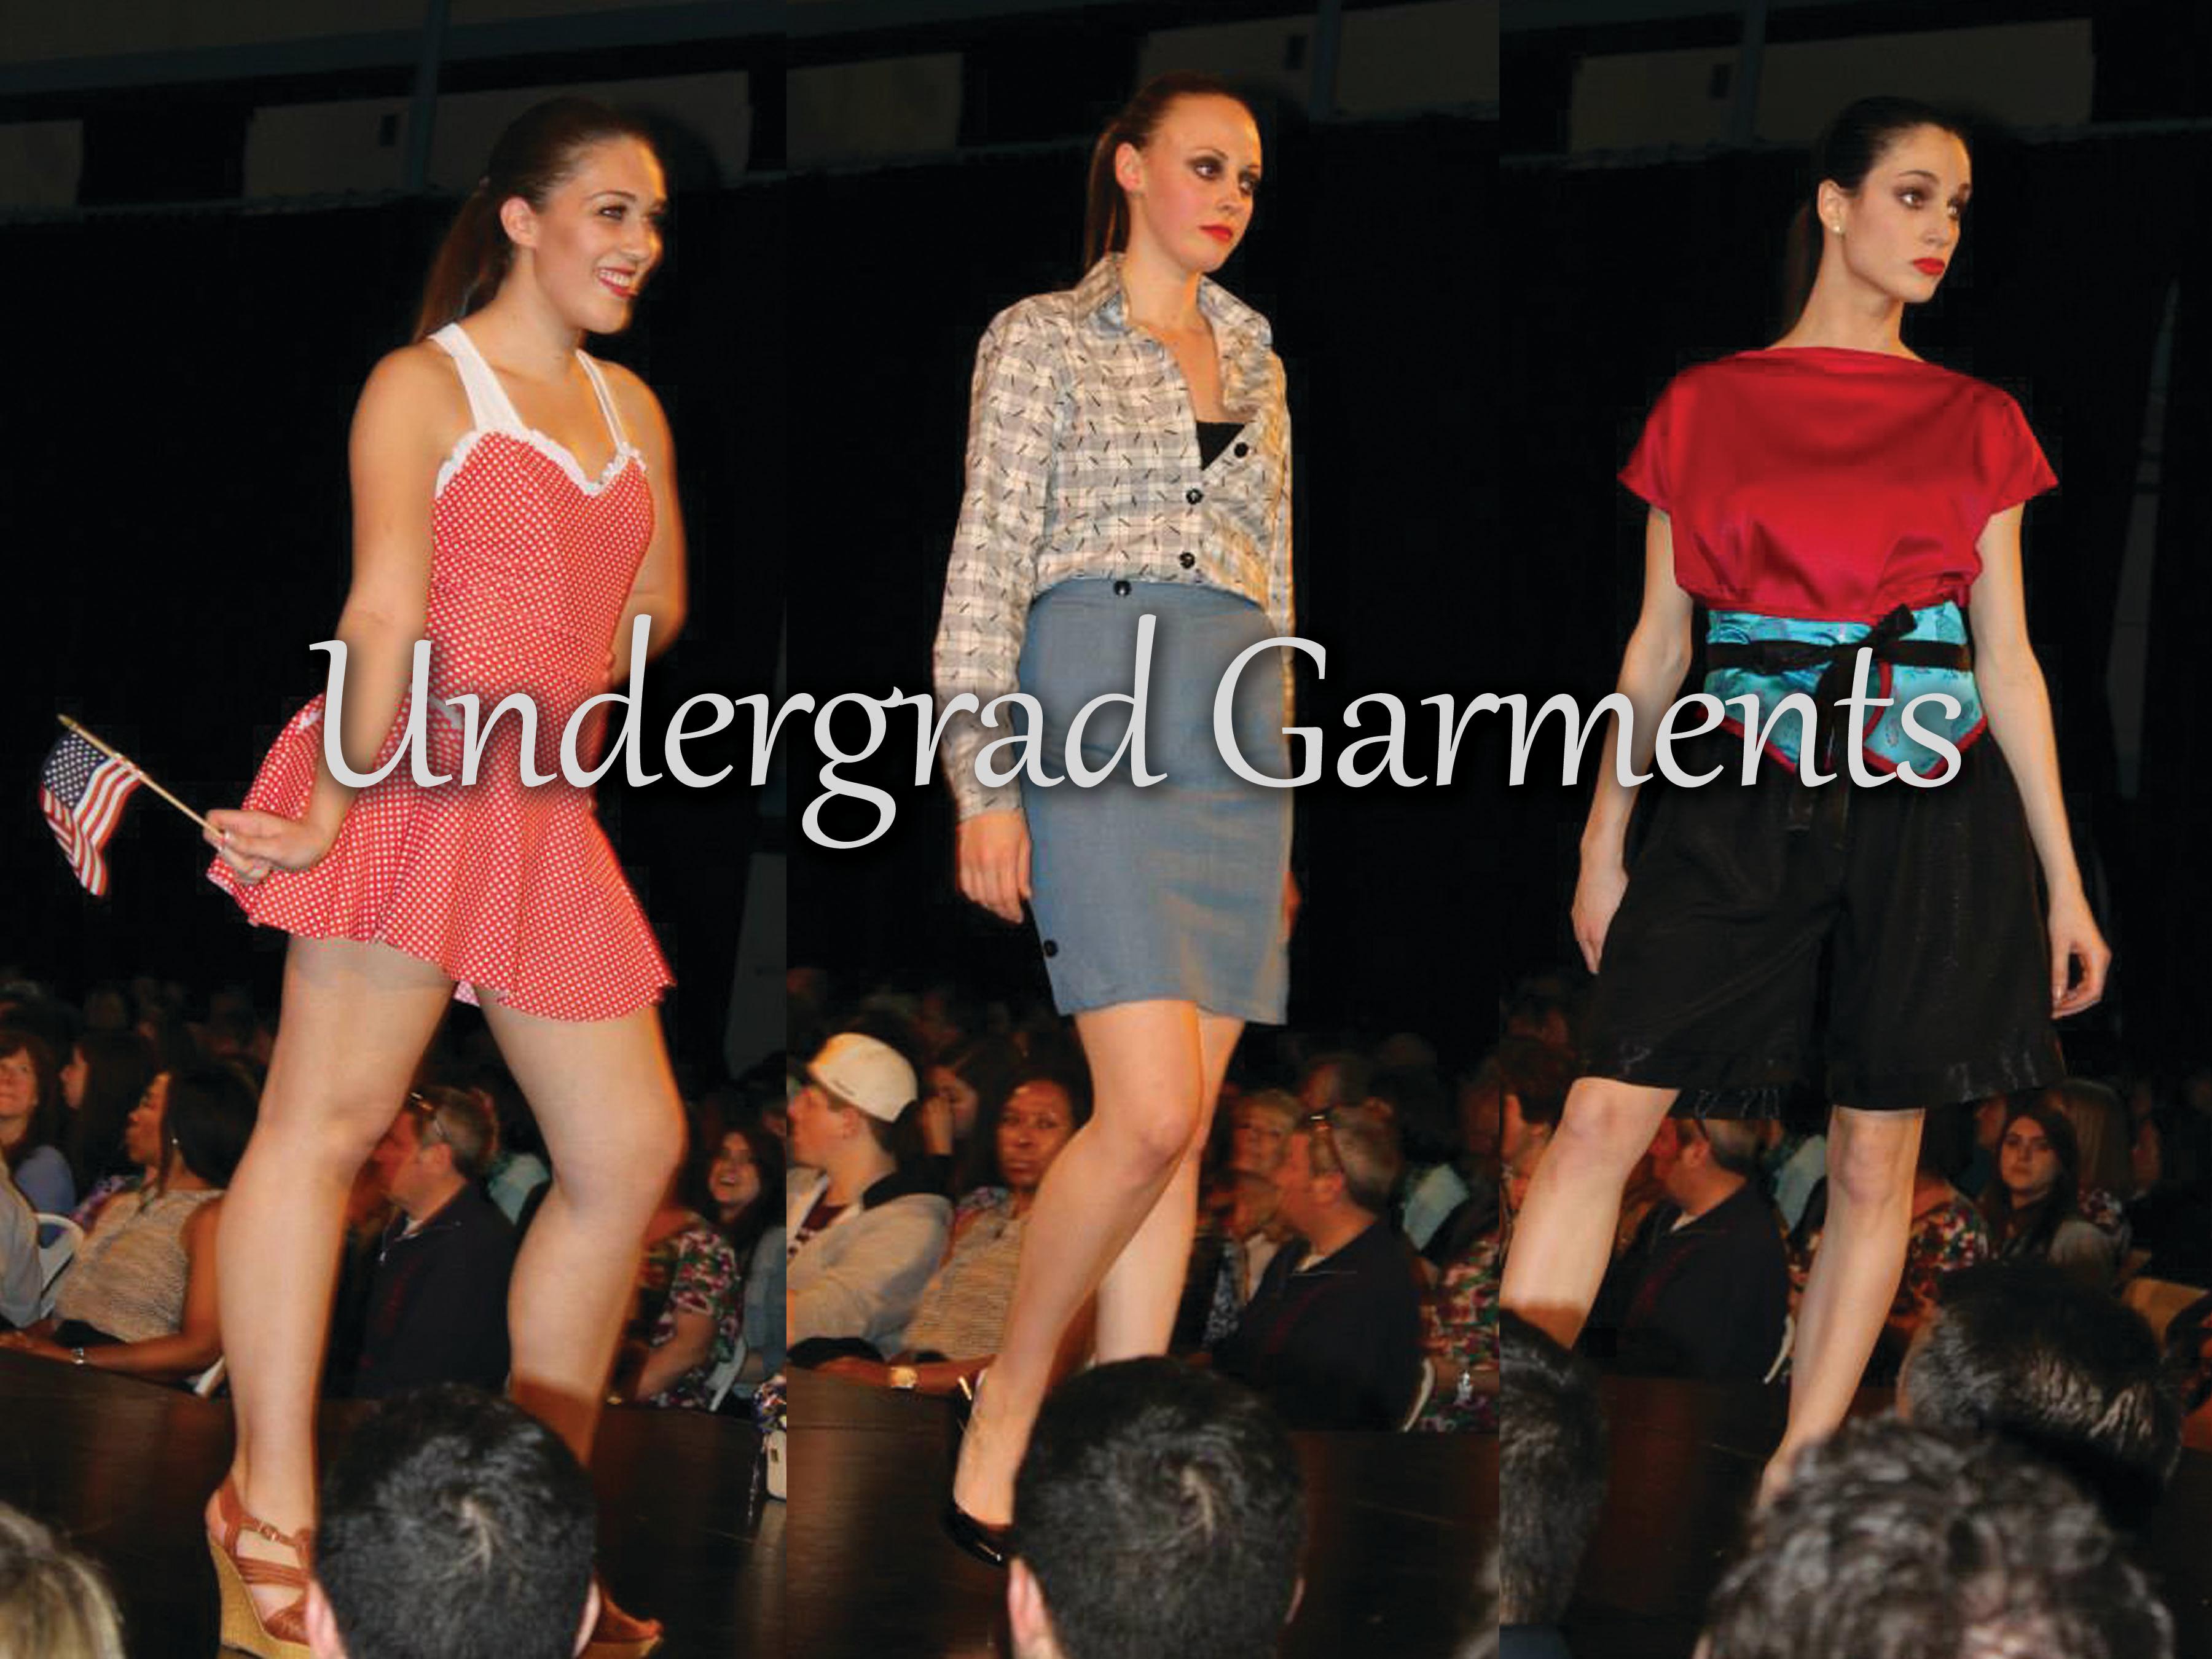 Undergrad Garments